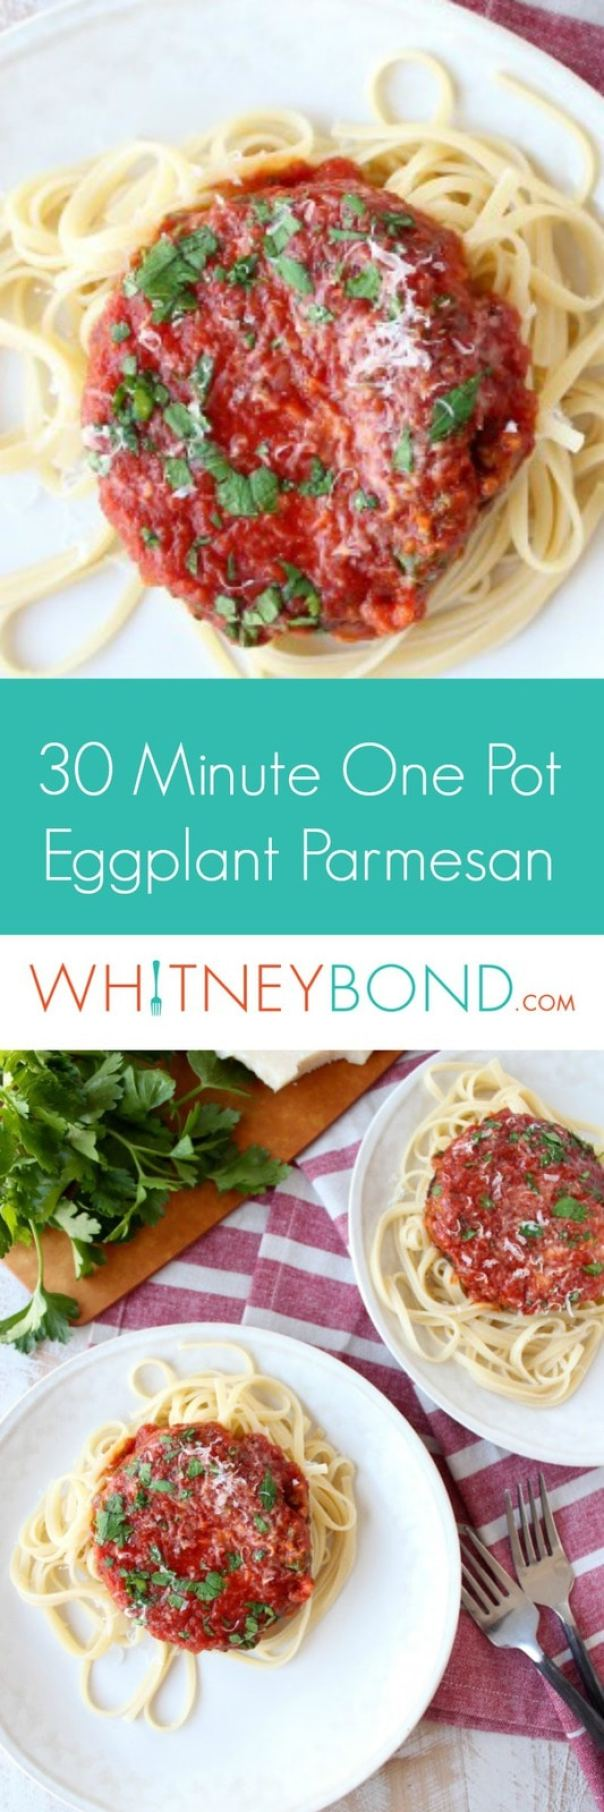 30 Minute One-Pot Easy Eggplant Parmesan Recipe